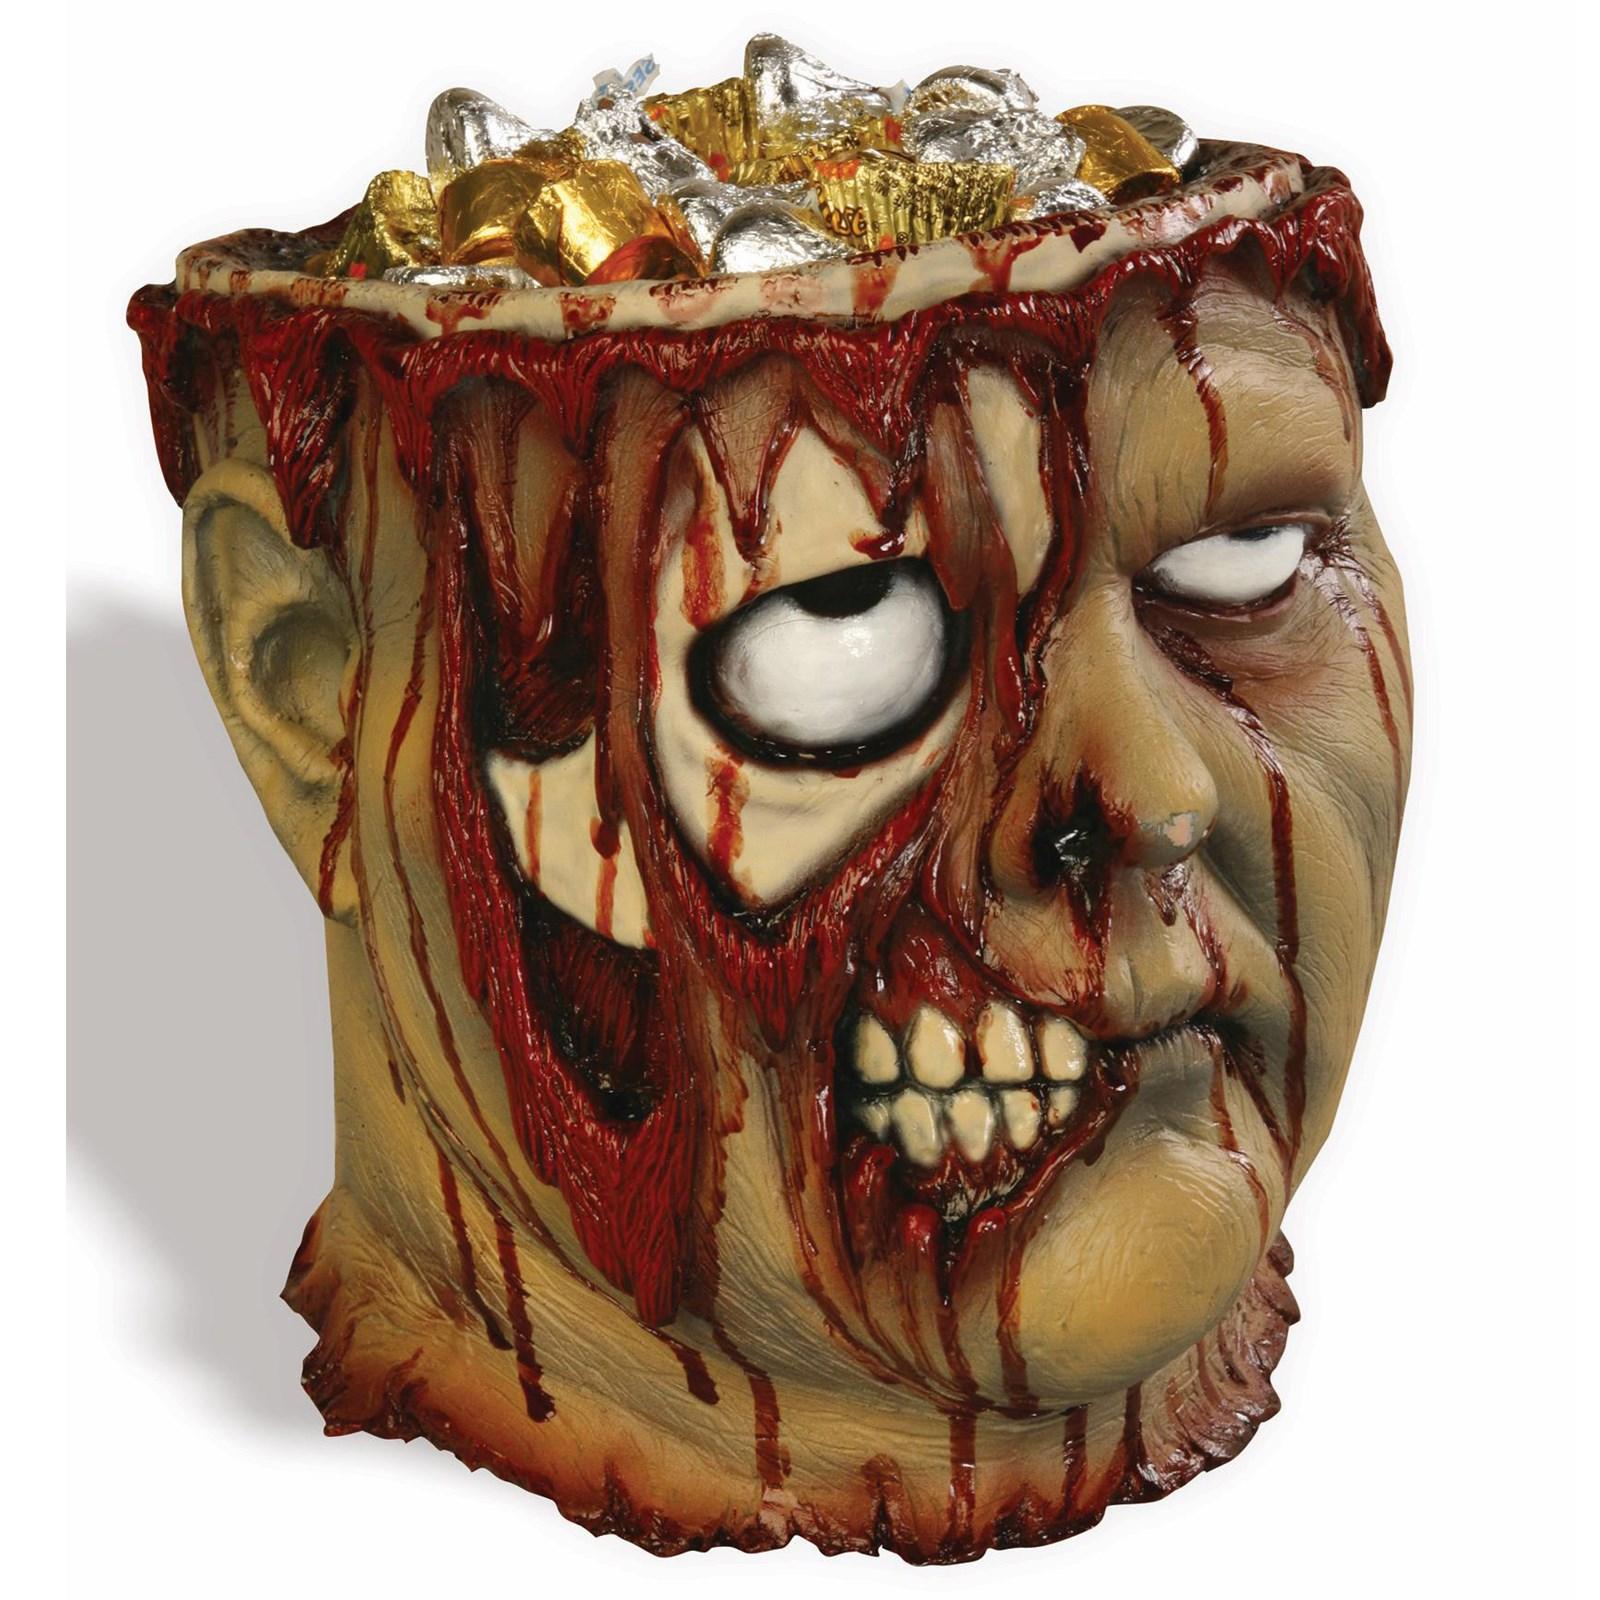 Bleeding Zombie Bucket